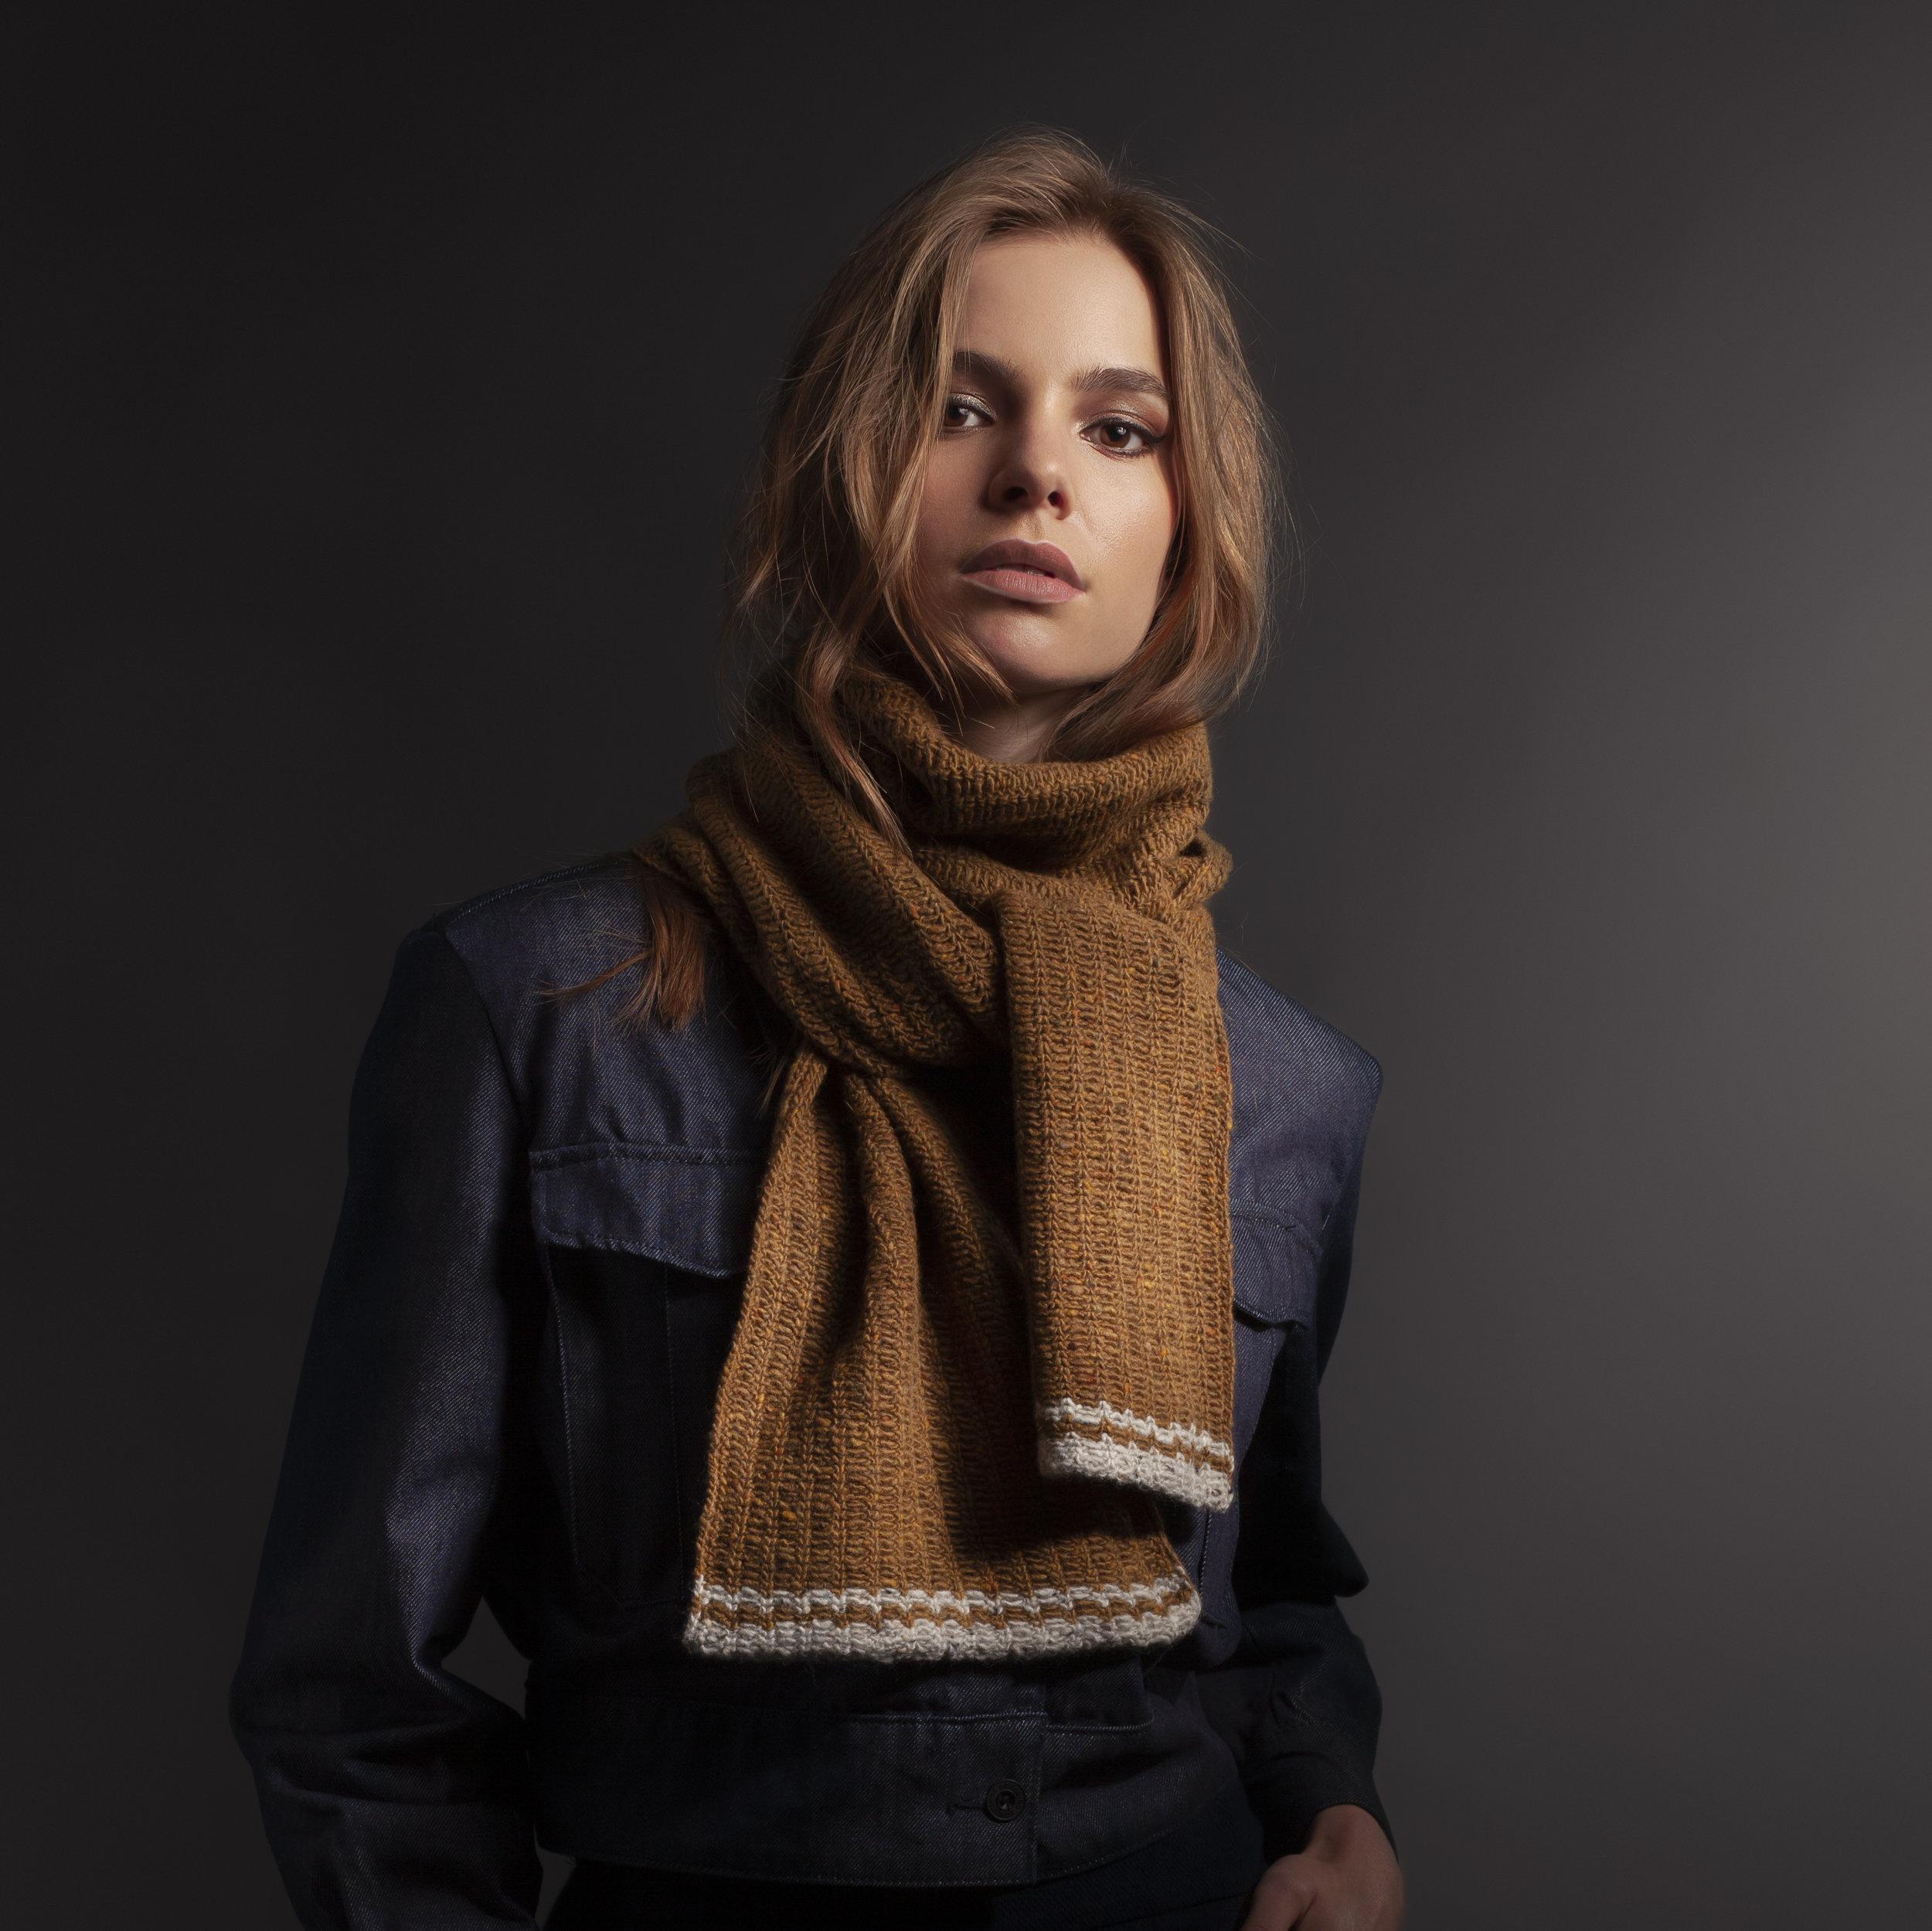 Kate-Jones-Arranmore-Scarf2.jpg